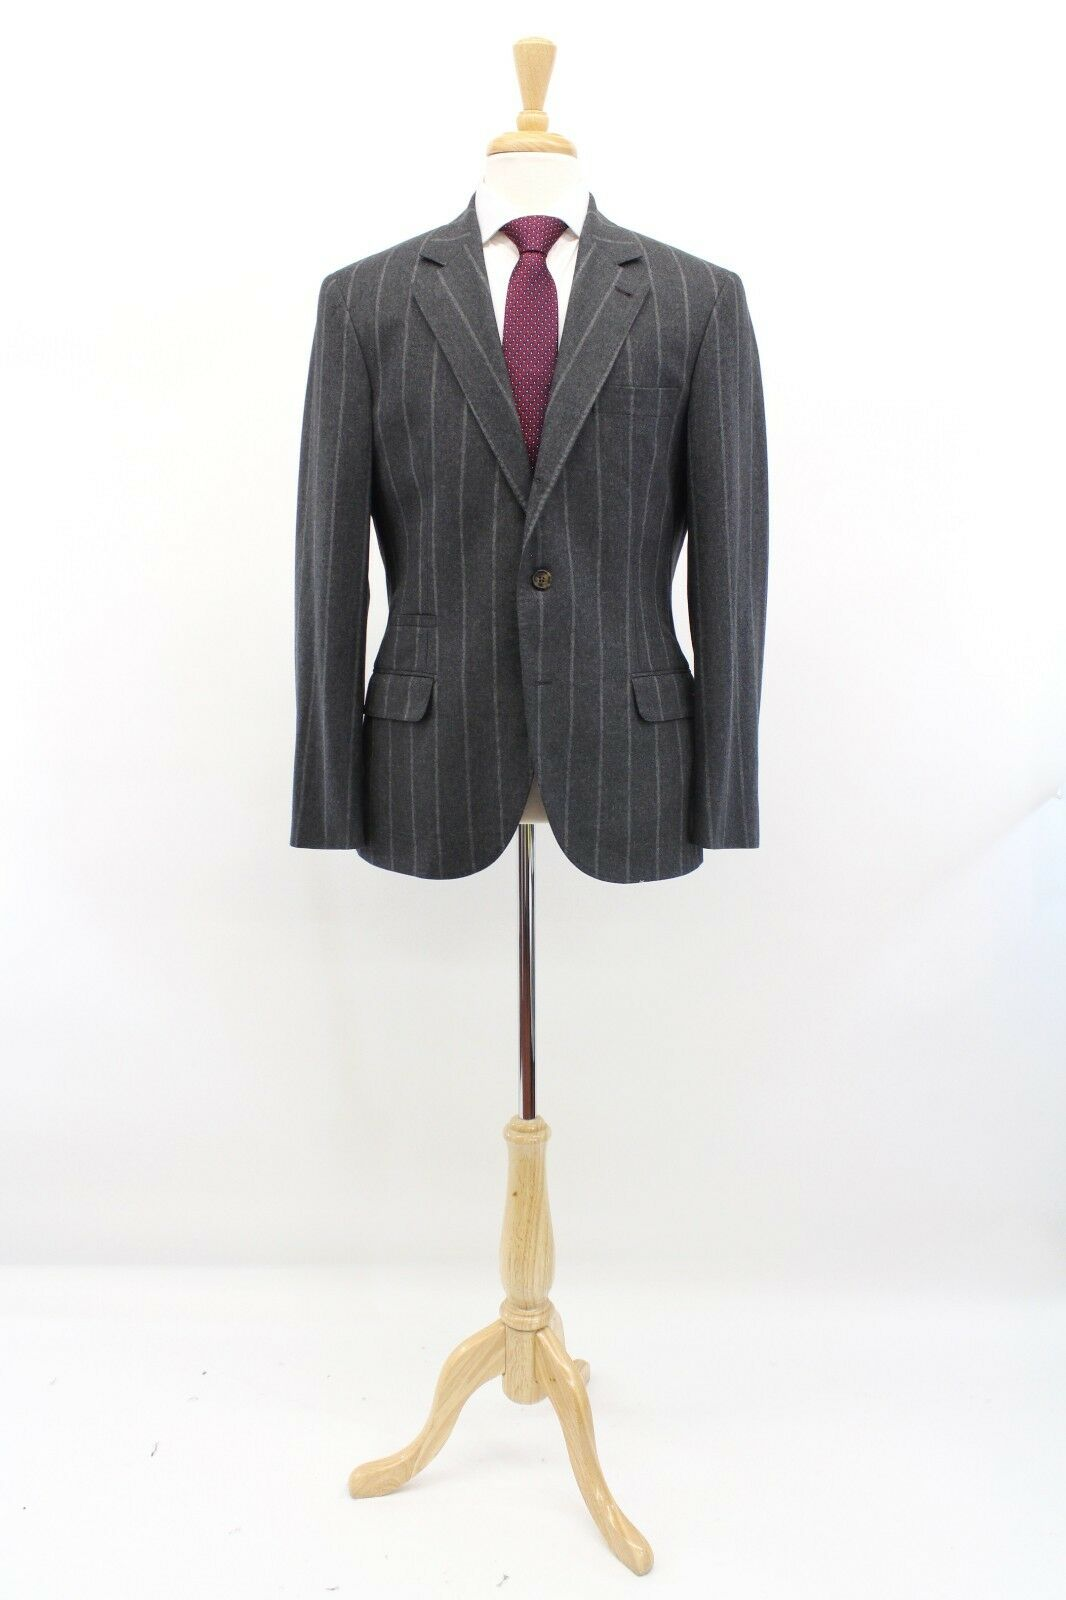 NWT Brunello Cucinelli Silk-Linen-Wool Knit Striped Sport Coat 50 40US A181